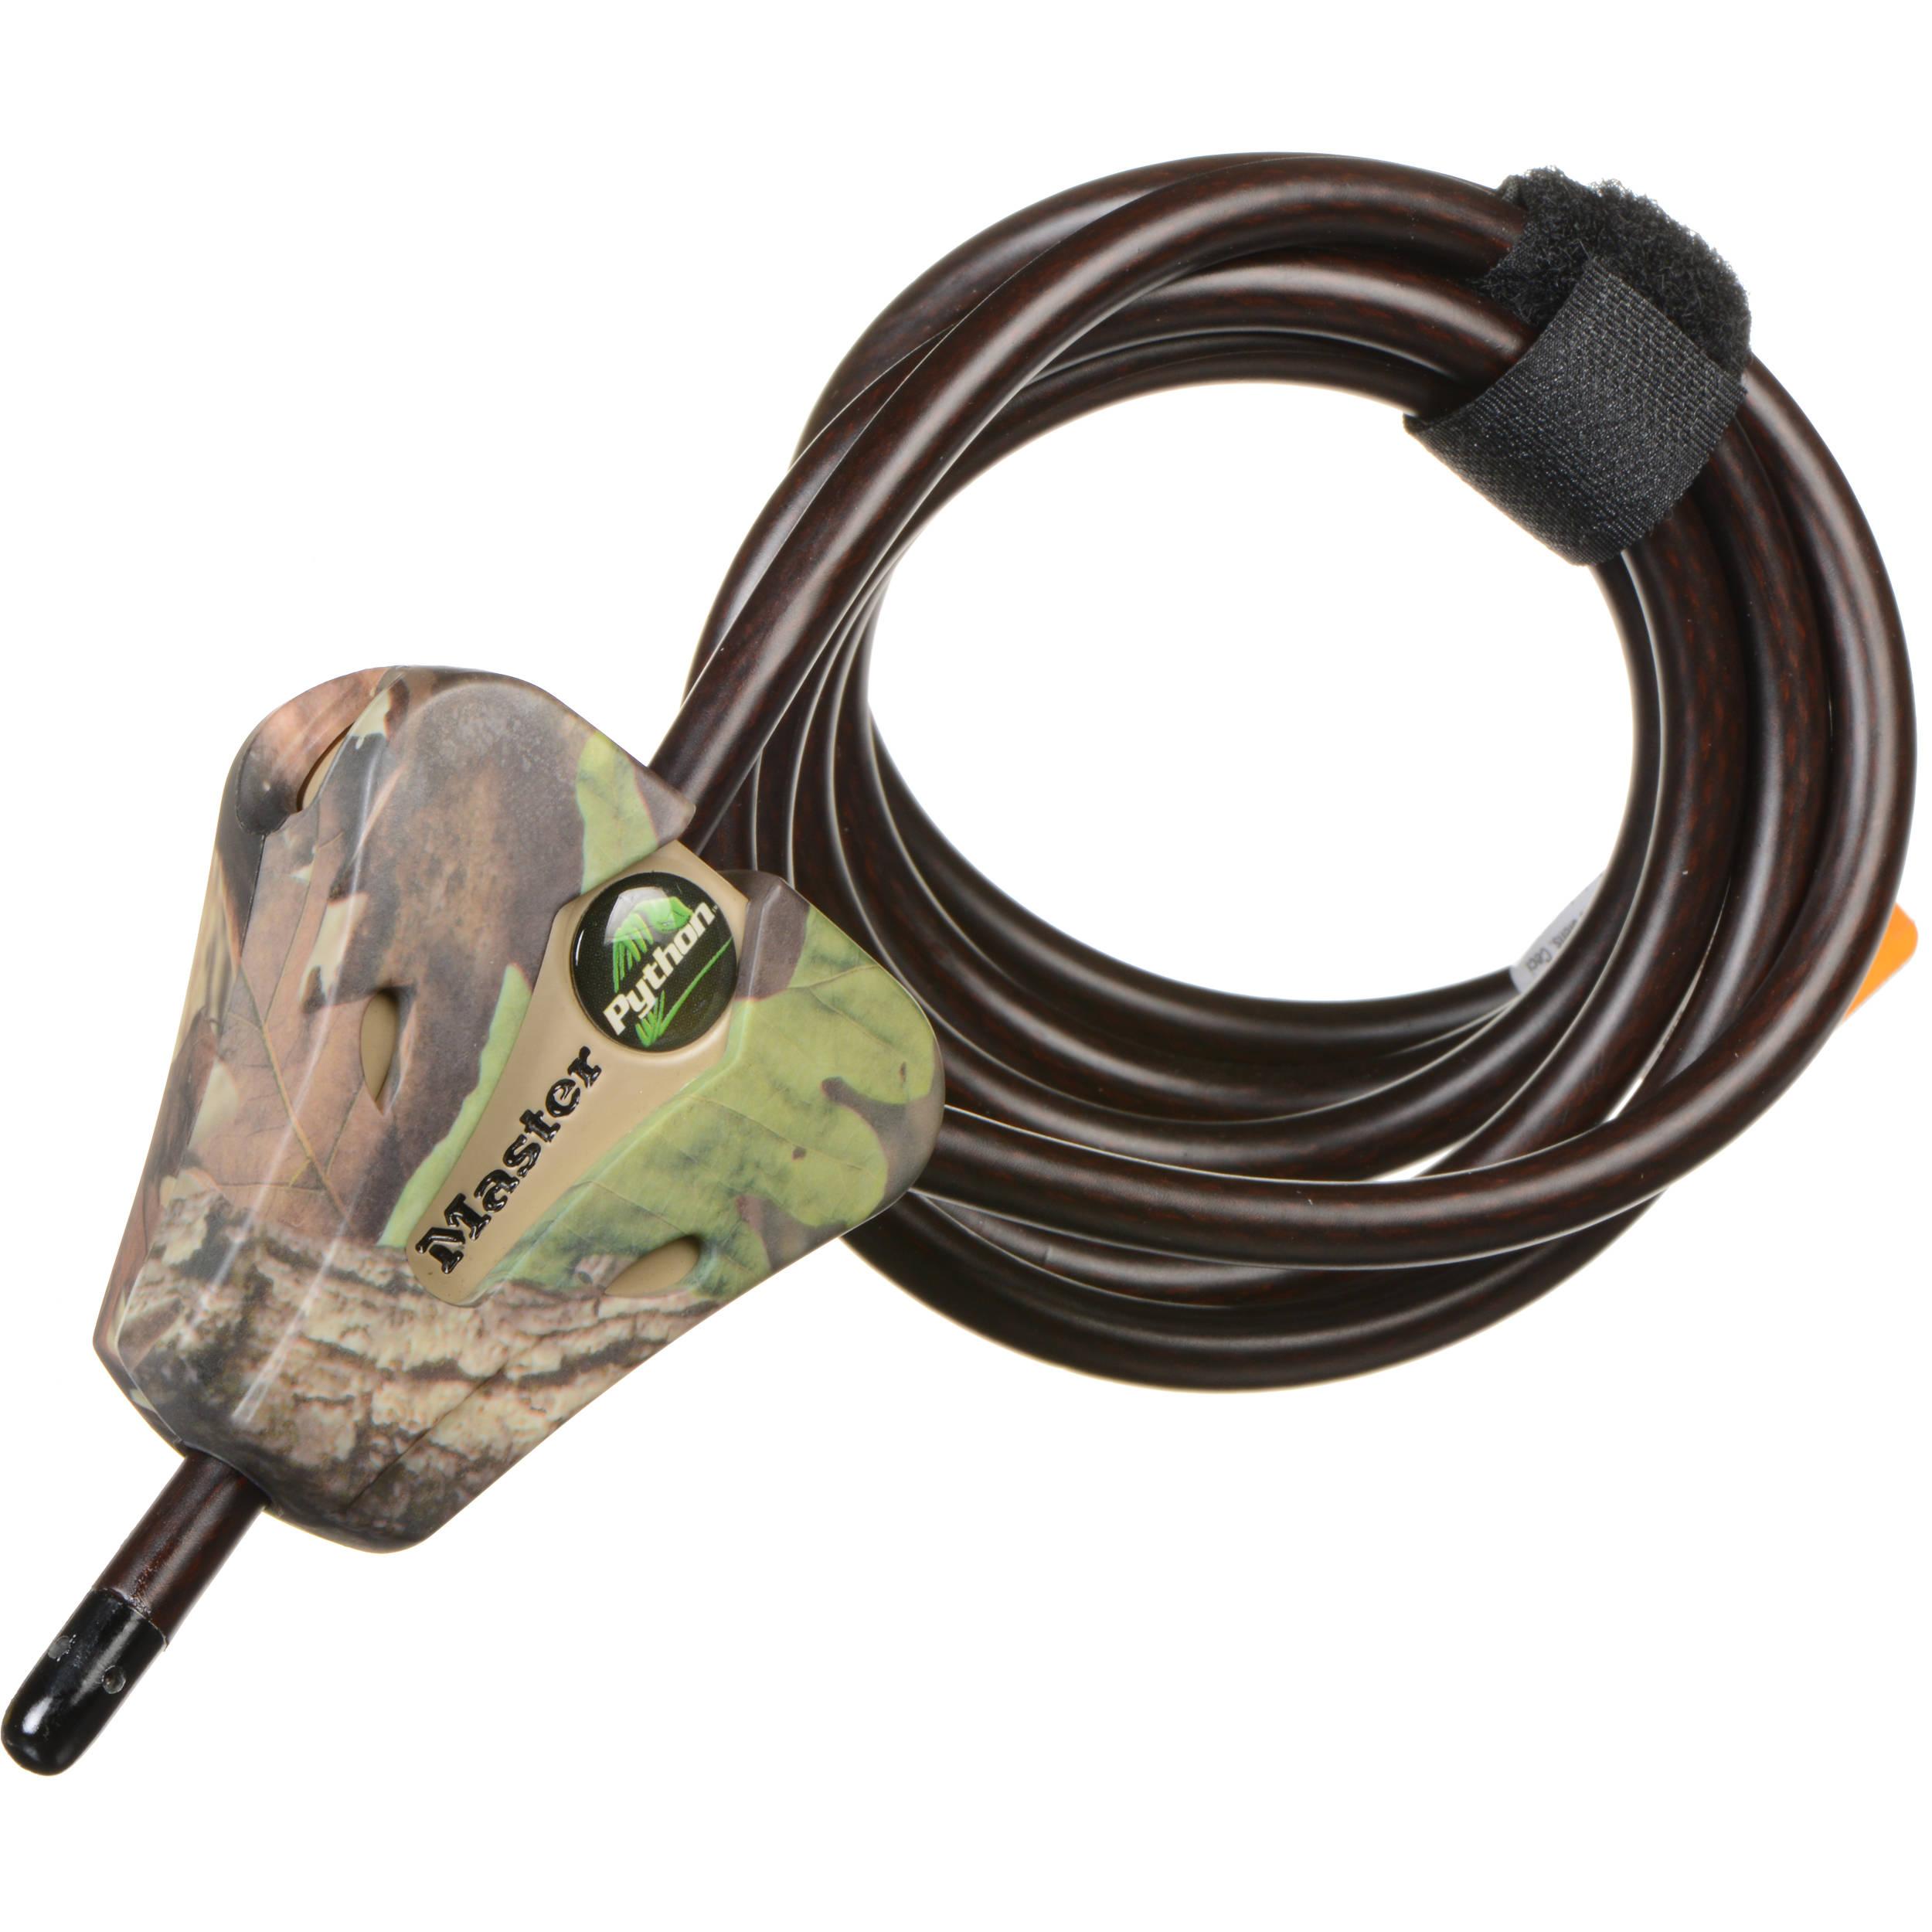 Covert Scouting Cameras Master Lock Python Trail Camera 2151 B&H